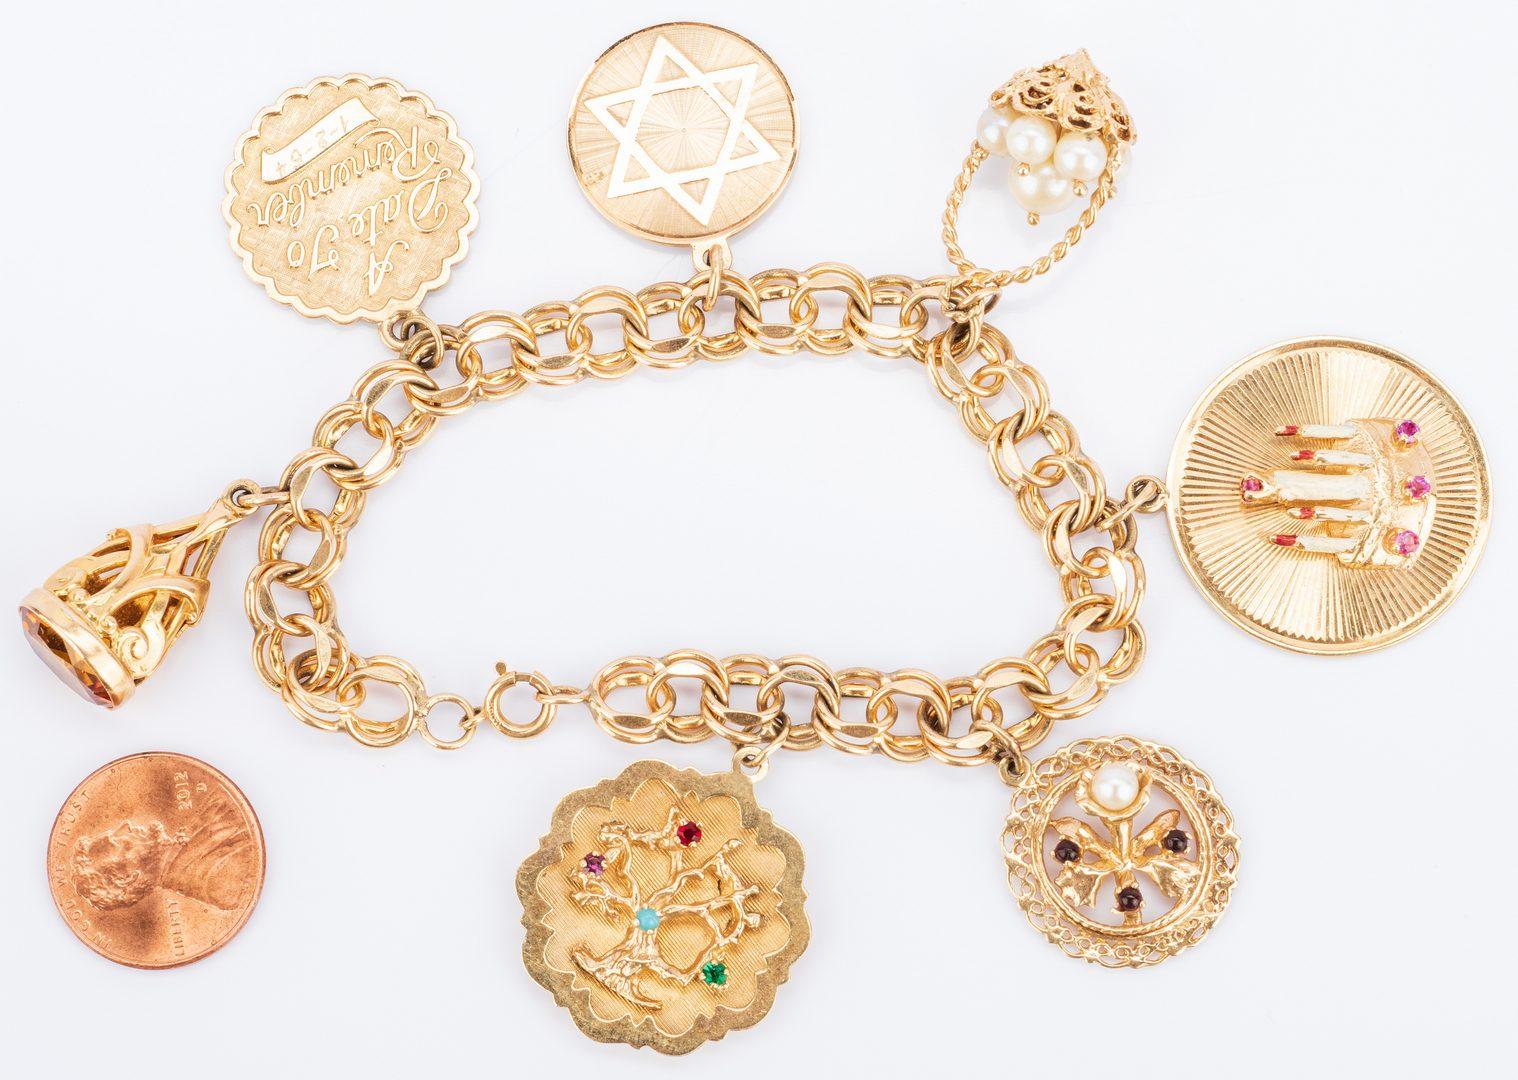 Lot 392: 14K Charm Bracelet, Judaica themes